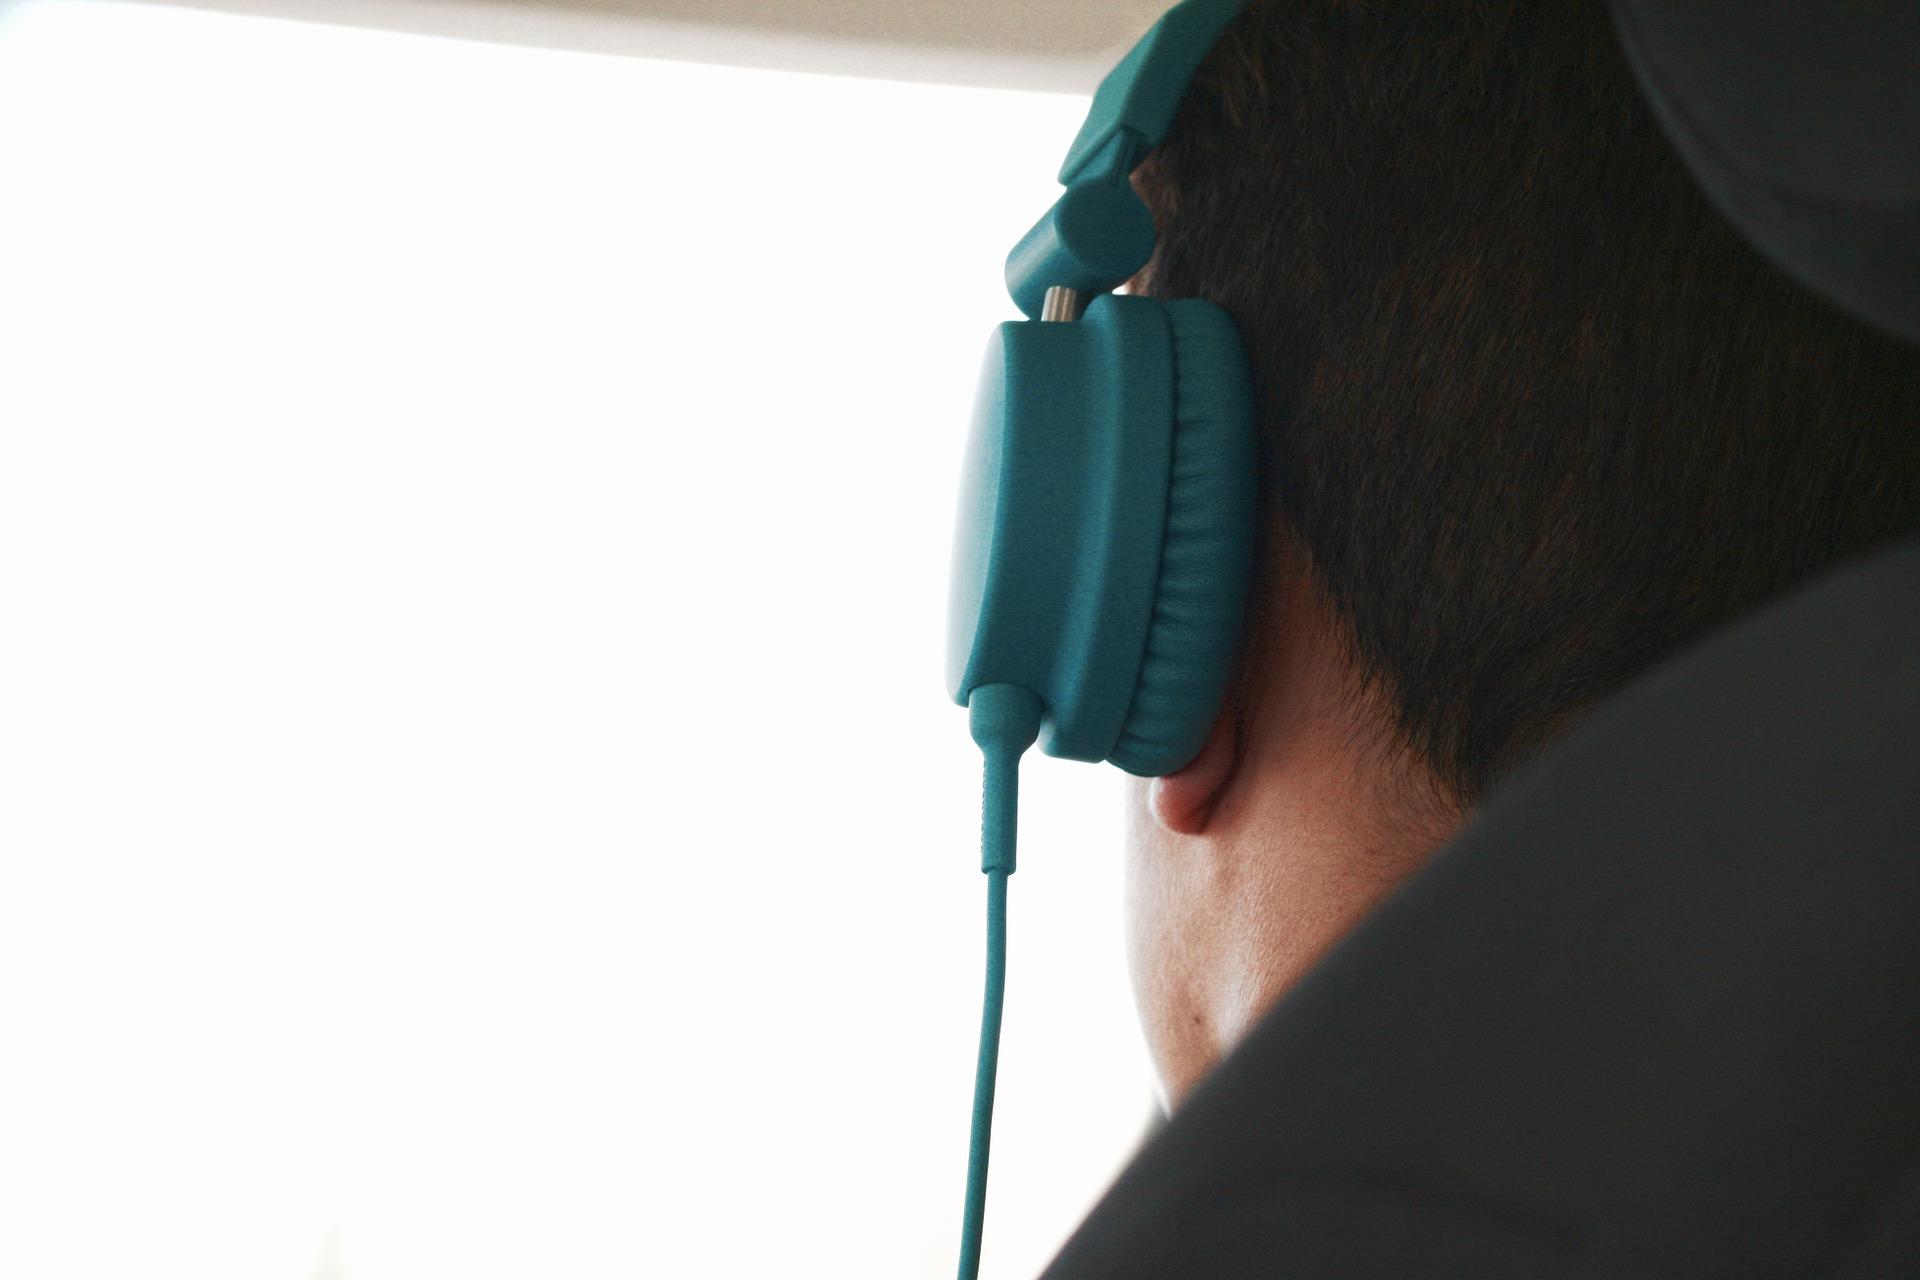 on-ear noise cancelling headphones